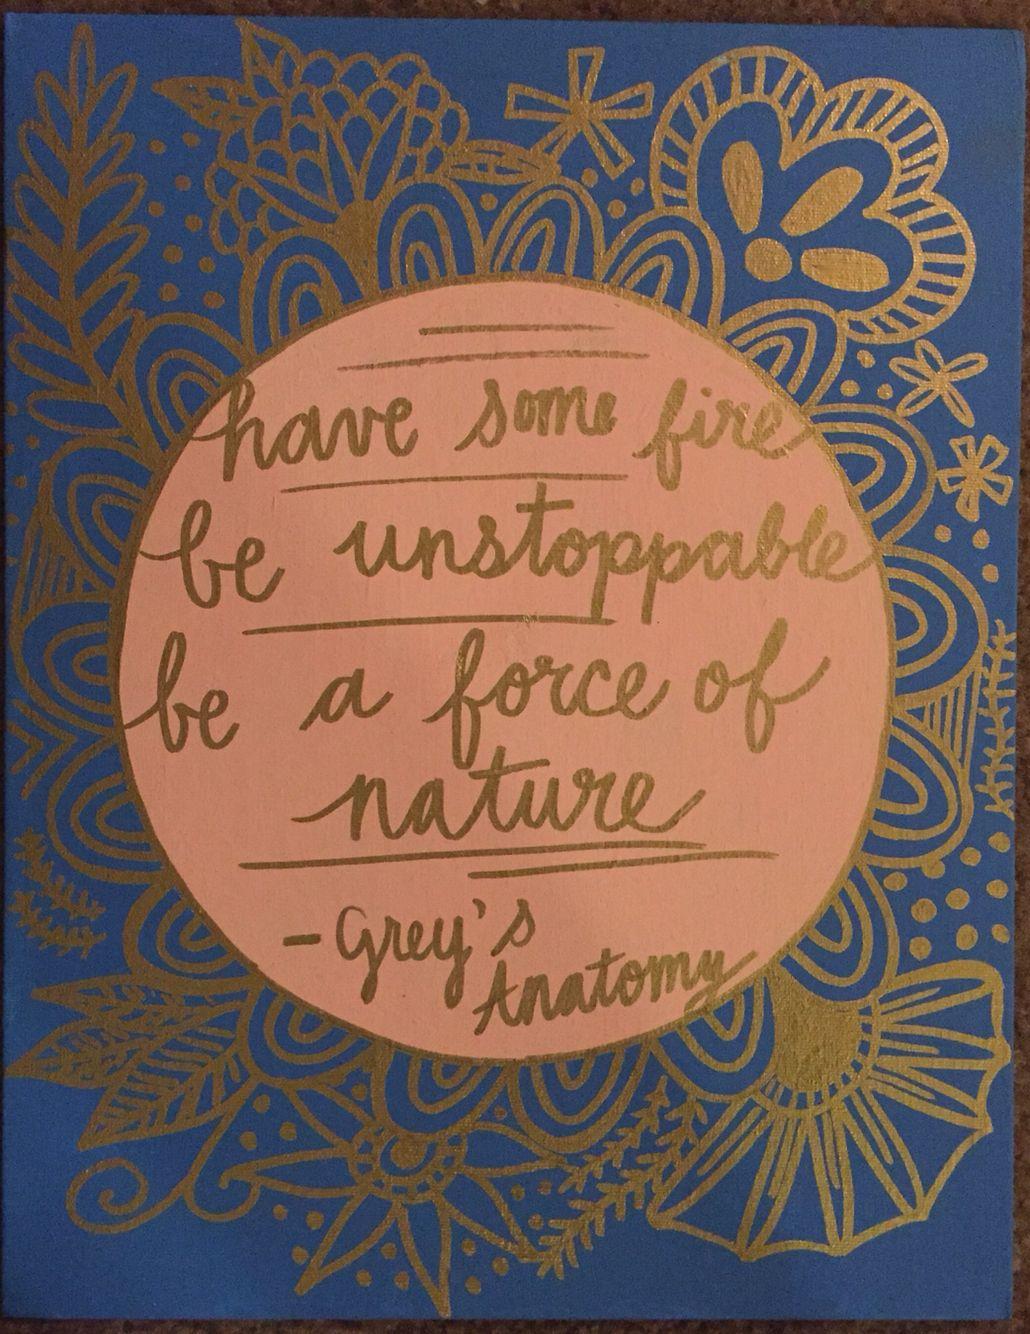 Grey\'s Anatomy quote on canvas | DPHIE | Pinterest | Anatomía de ...